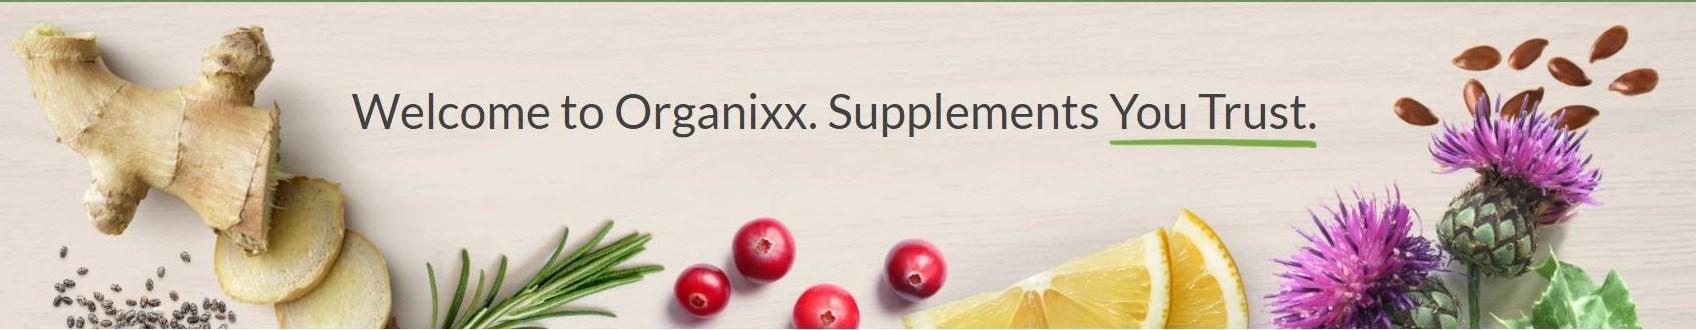 Supplements you trust.